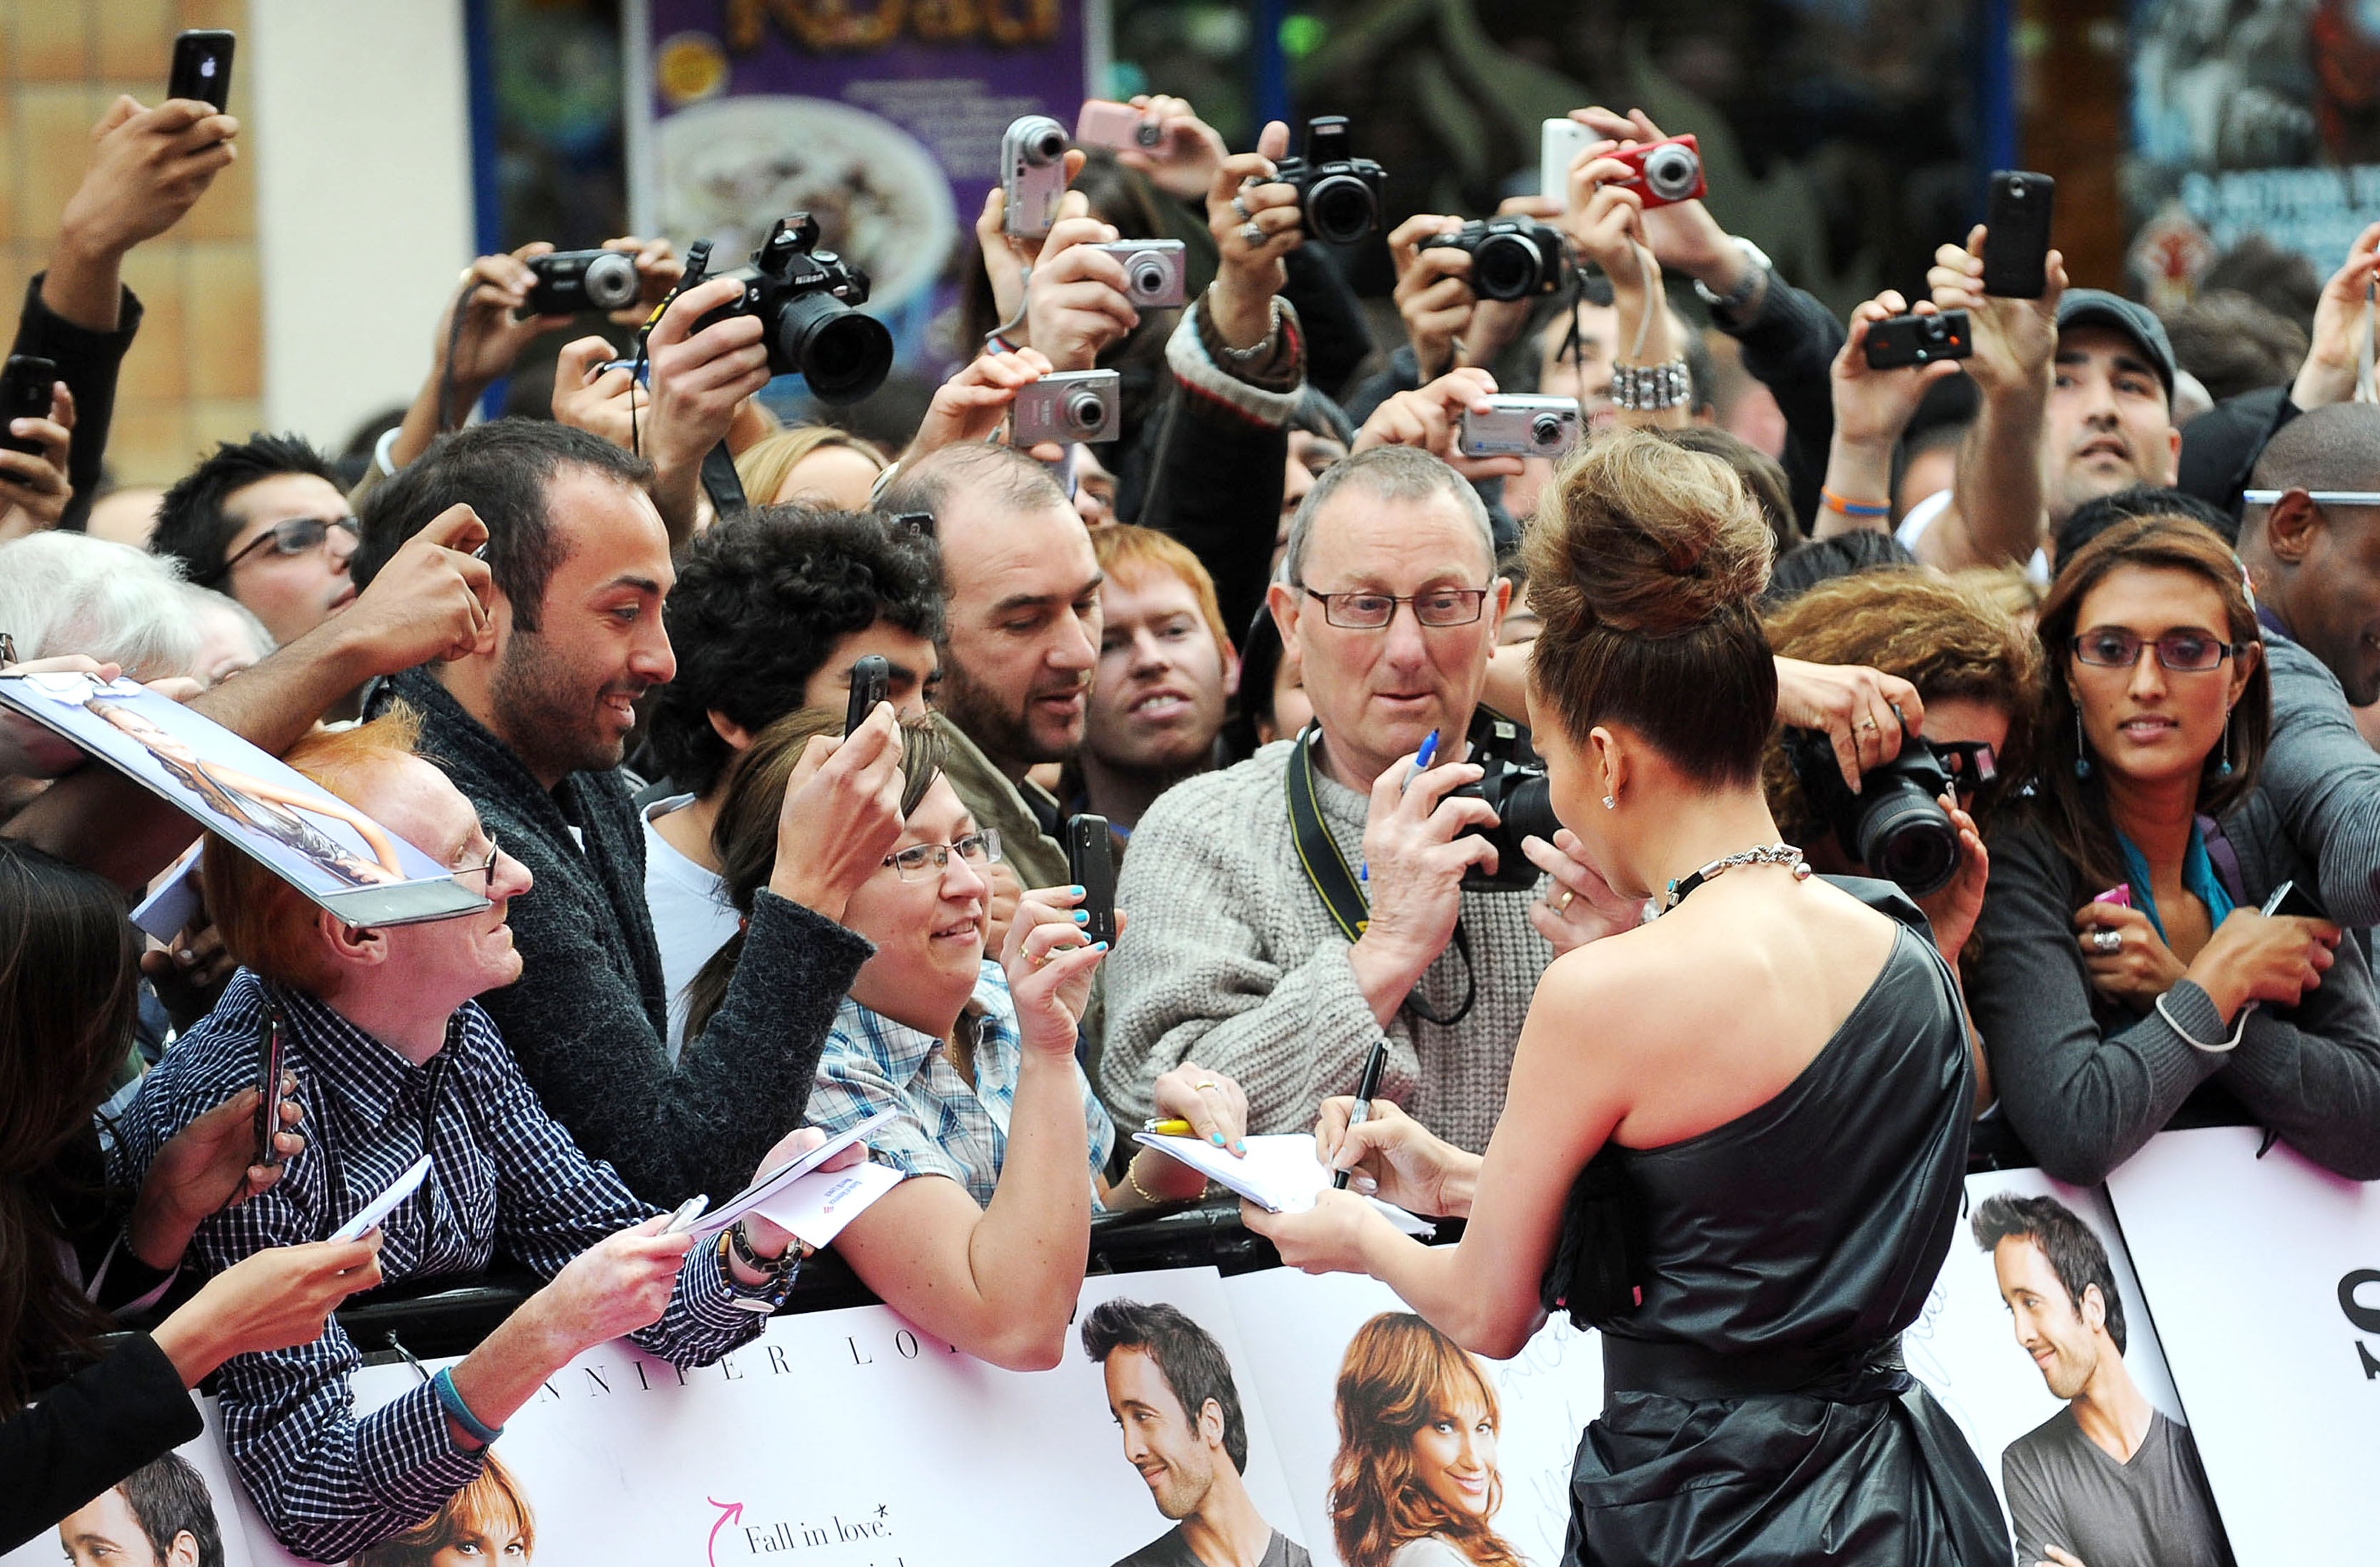 50387_celebrity_paradise.com_TheElder_JenniferLopez2010_04_28_TheBack_UpPlanUKPremiere171_122_89lo.jpg